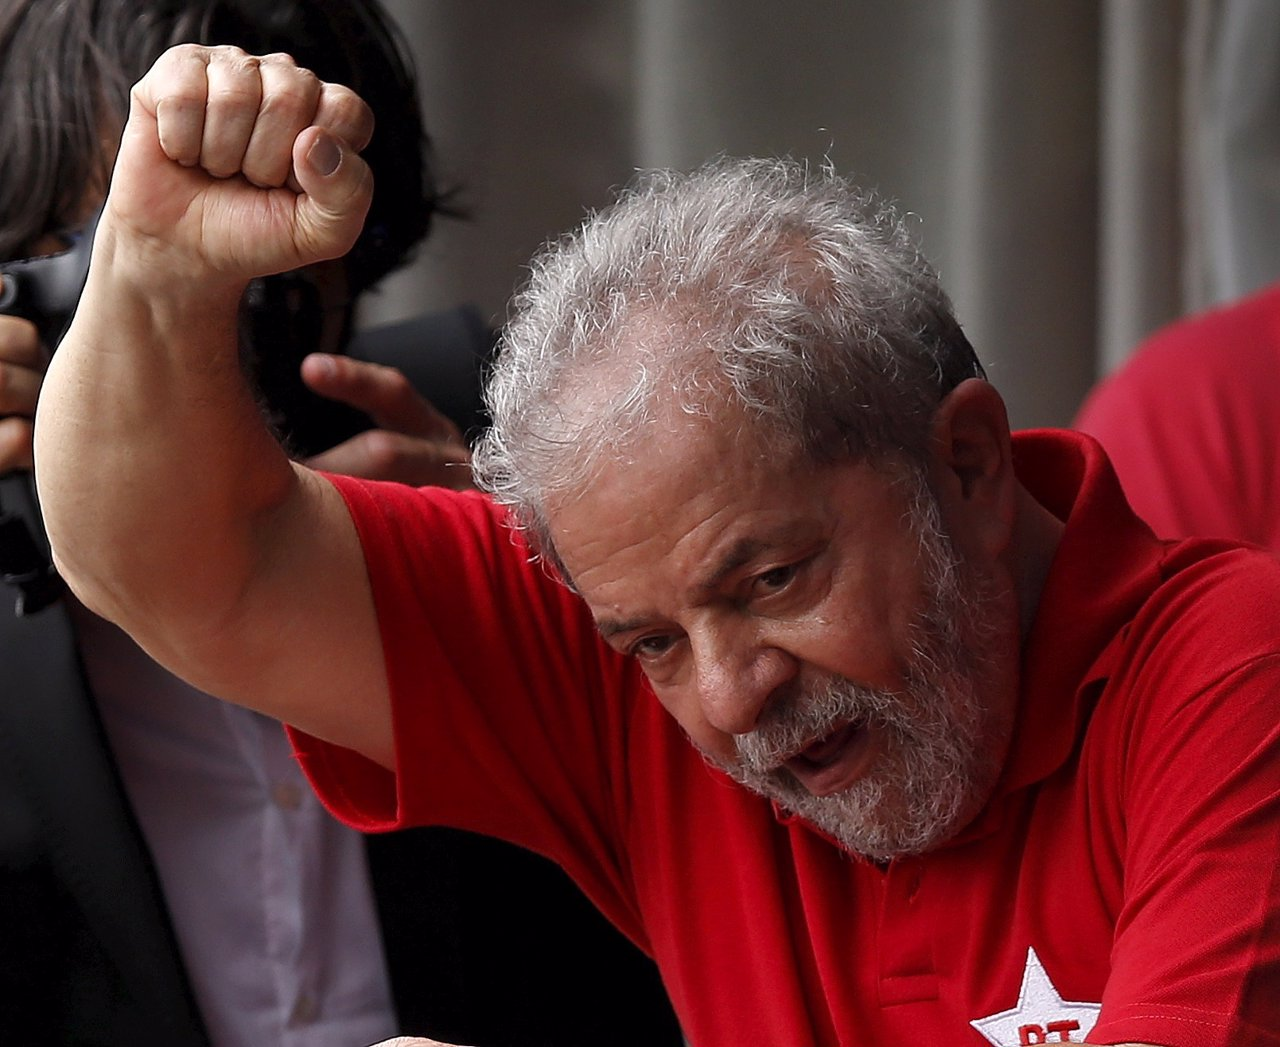 El ex presidente brasileño Luiz Inácio Lula da Silva